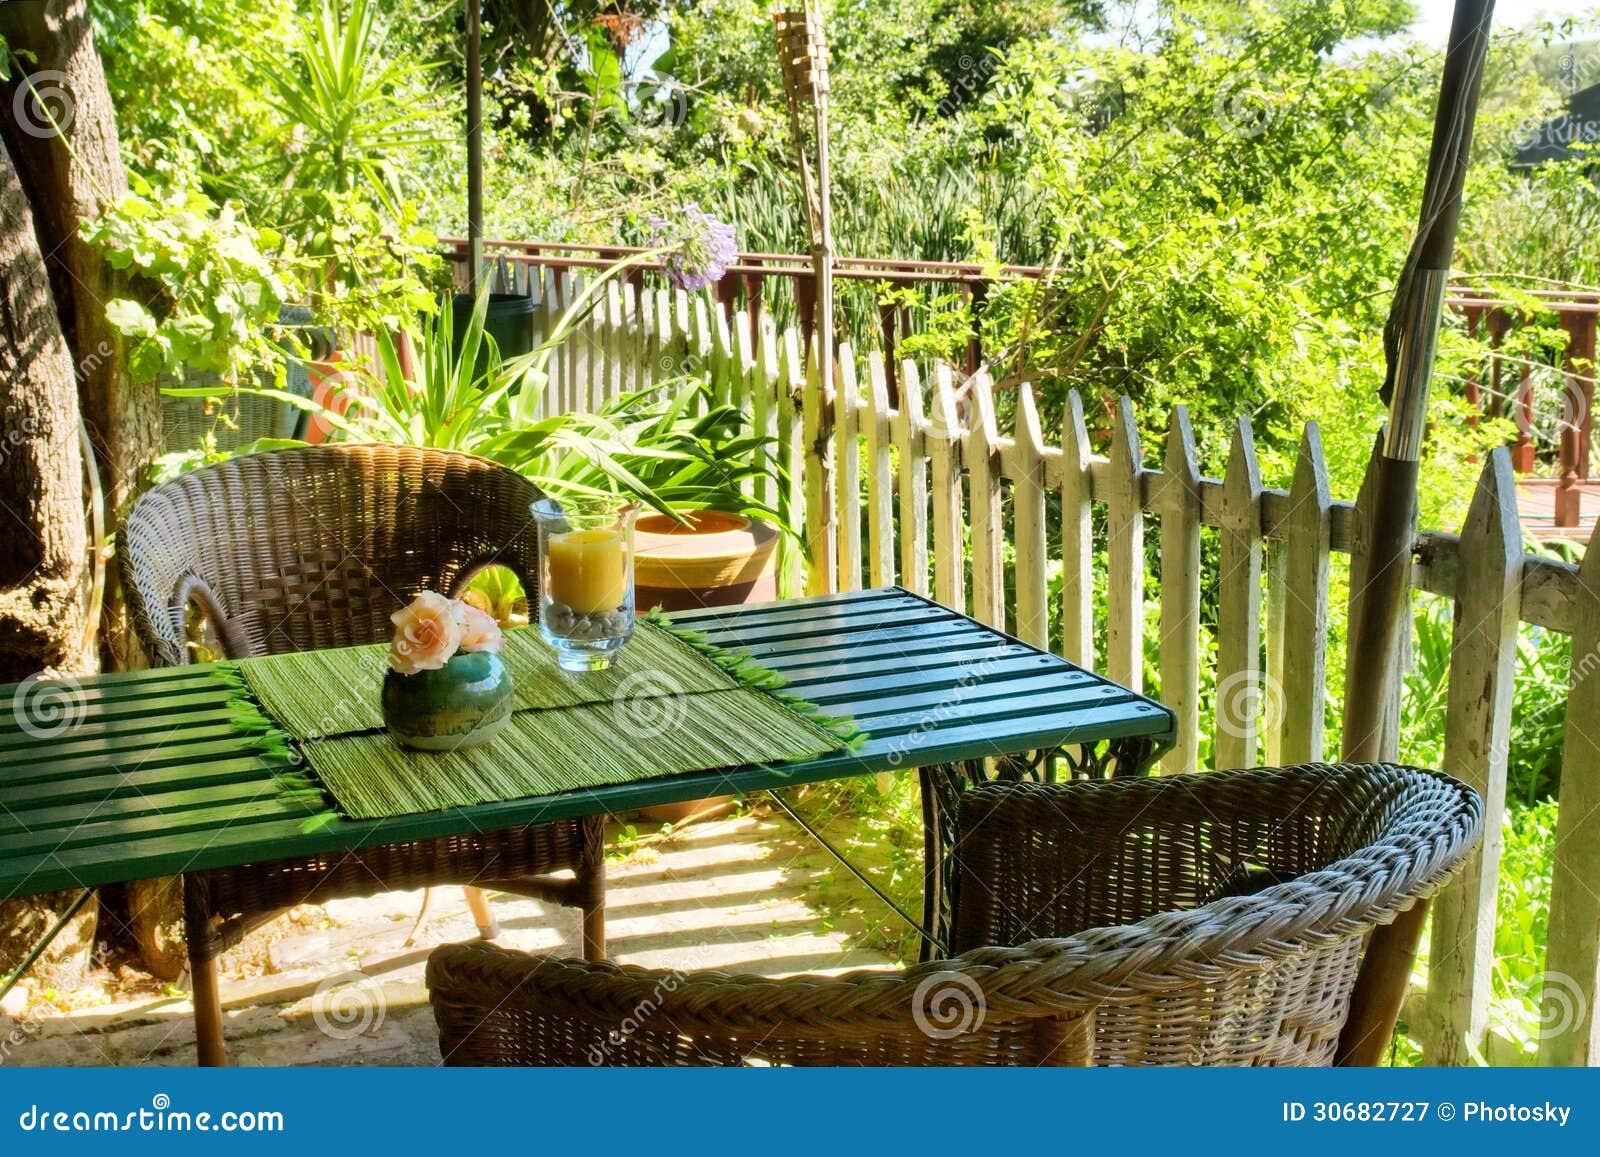 Table in outdoor Thai restaurant